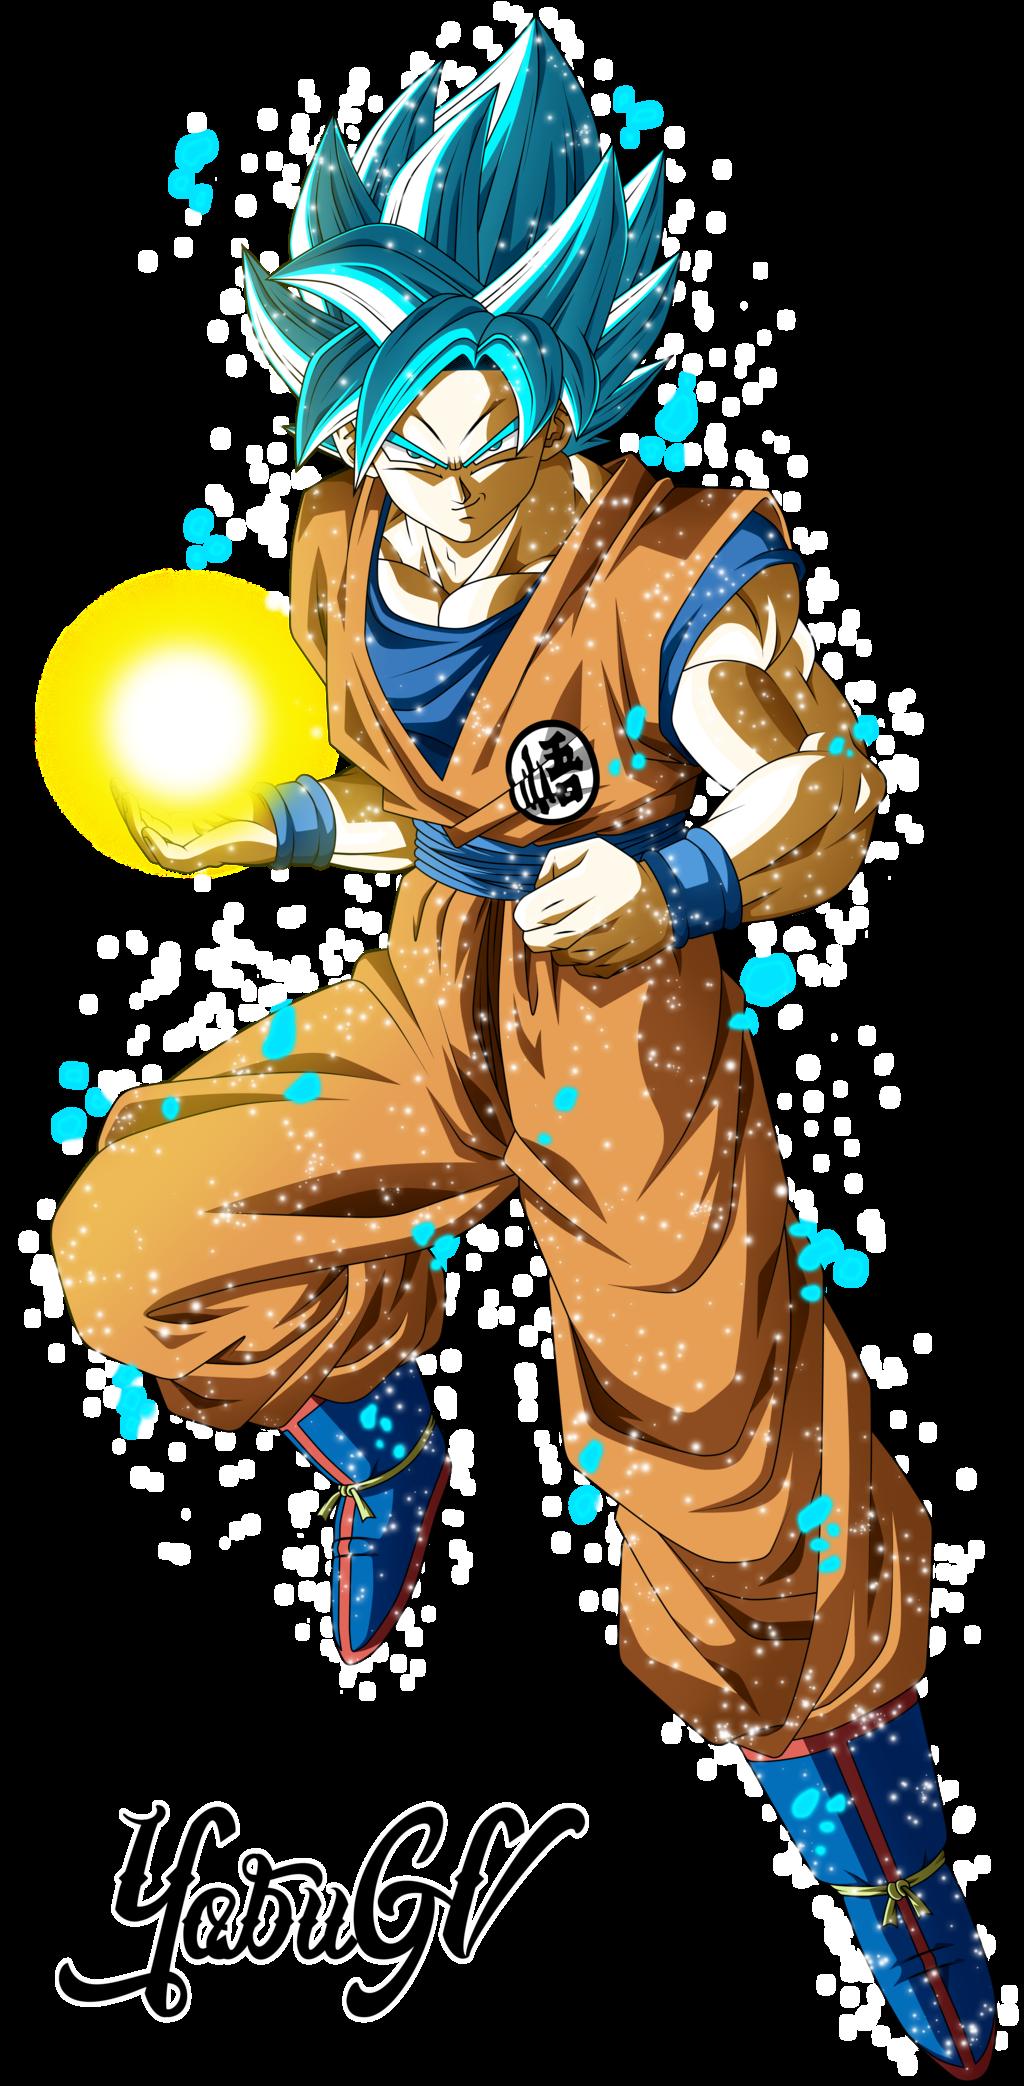 Goku Ssj Blue By Yobugv Dragon Ball Super Goku Dragon Ball Goku Goku Super Saiyan Blue